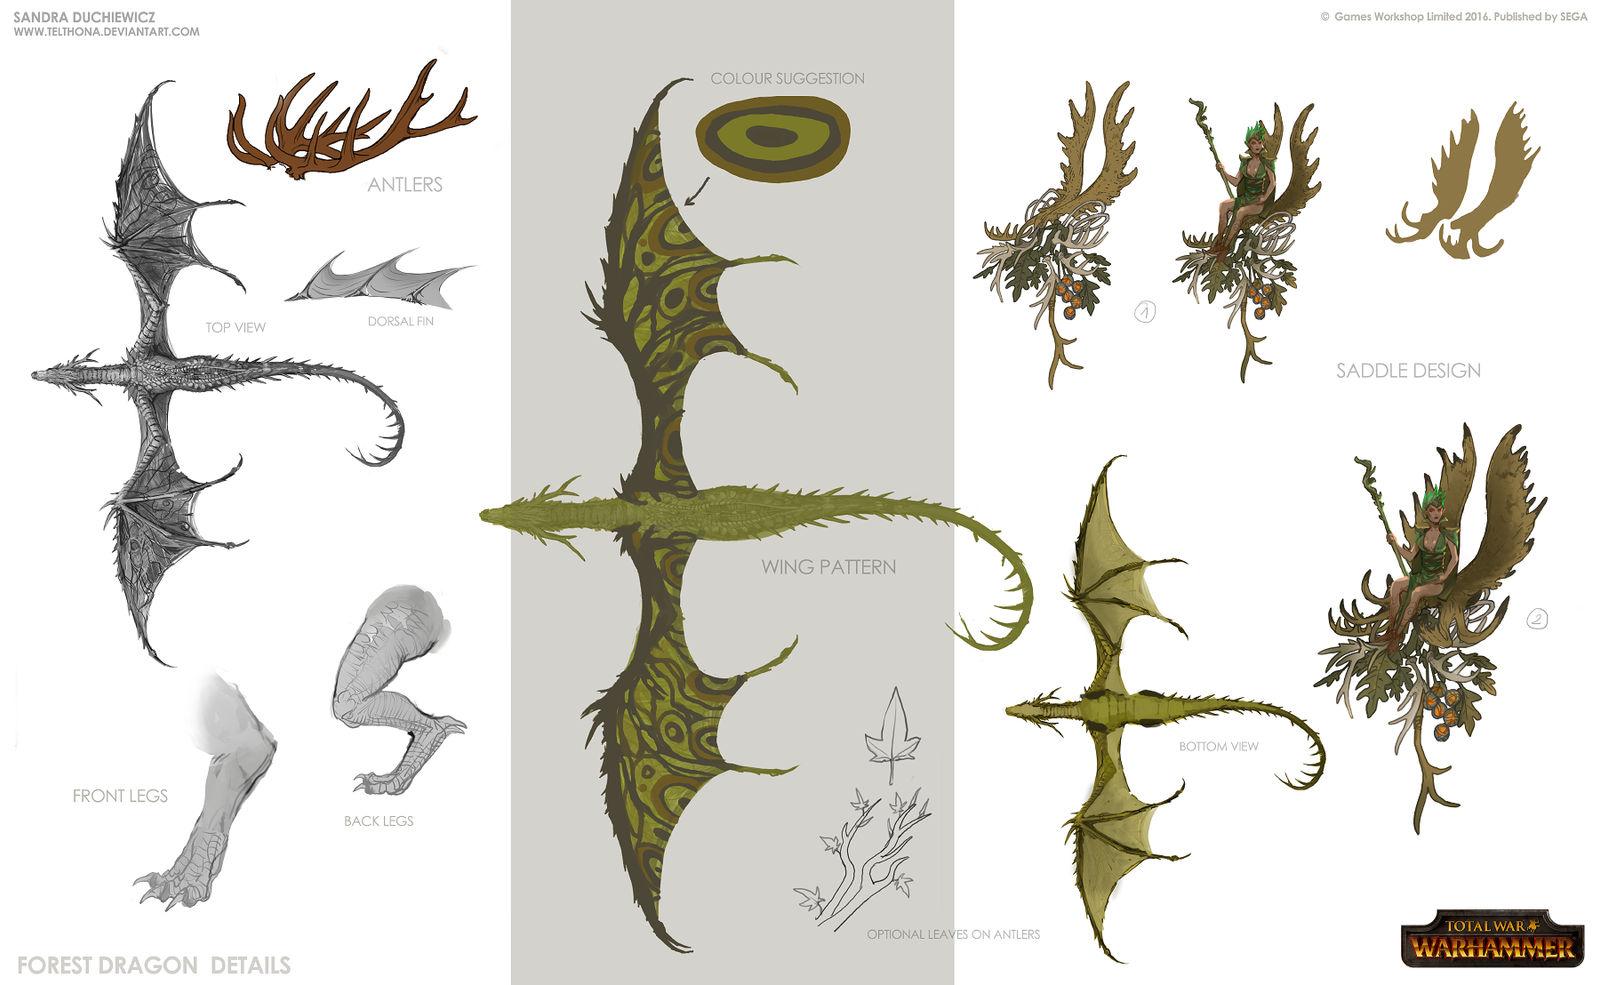 Total War: Warhammer Concept Art - Forest Dragon3